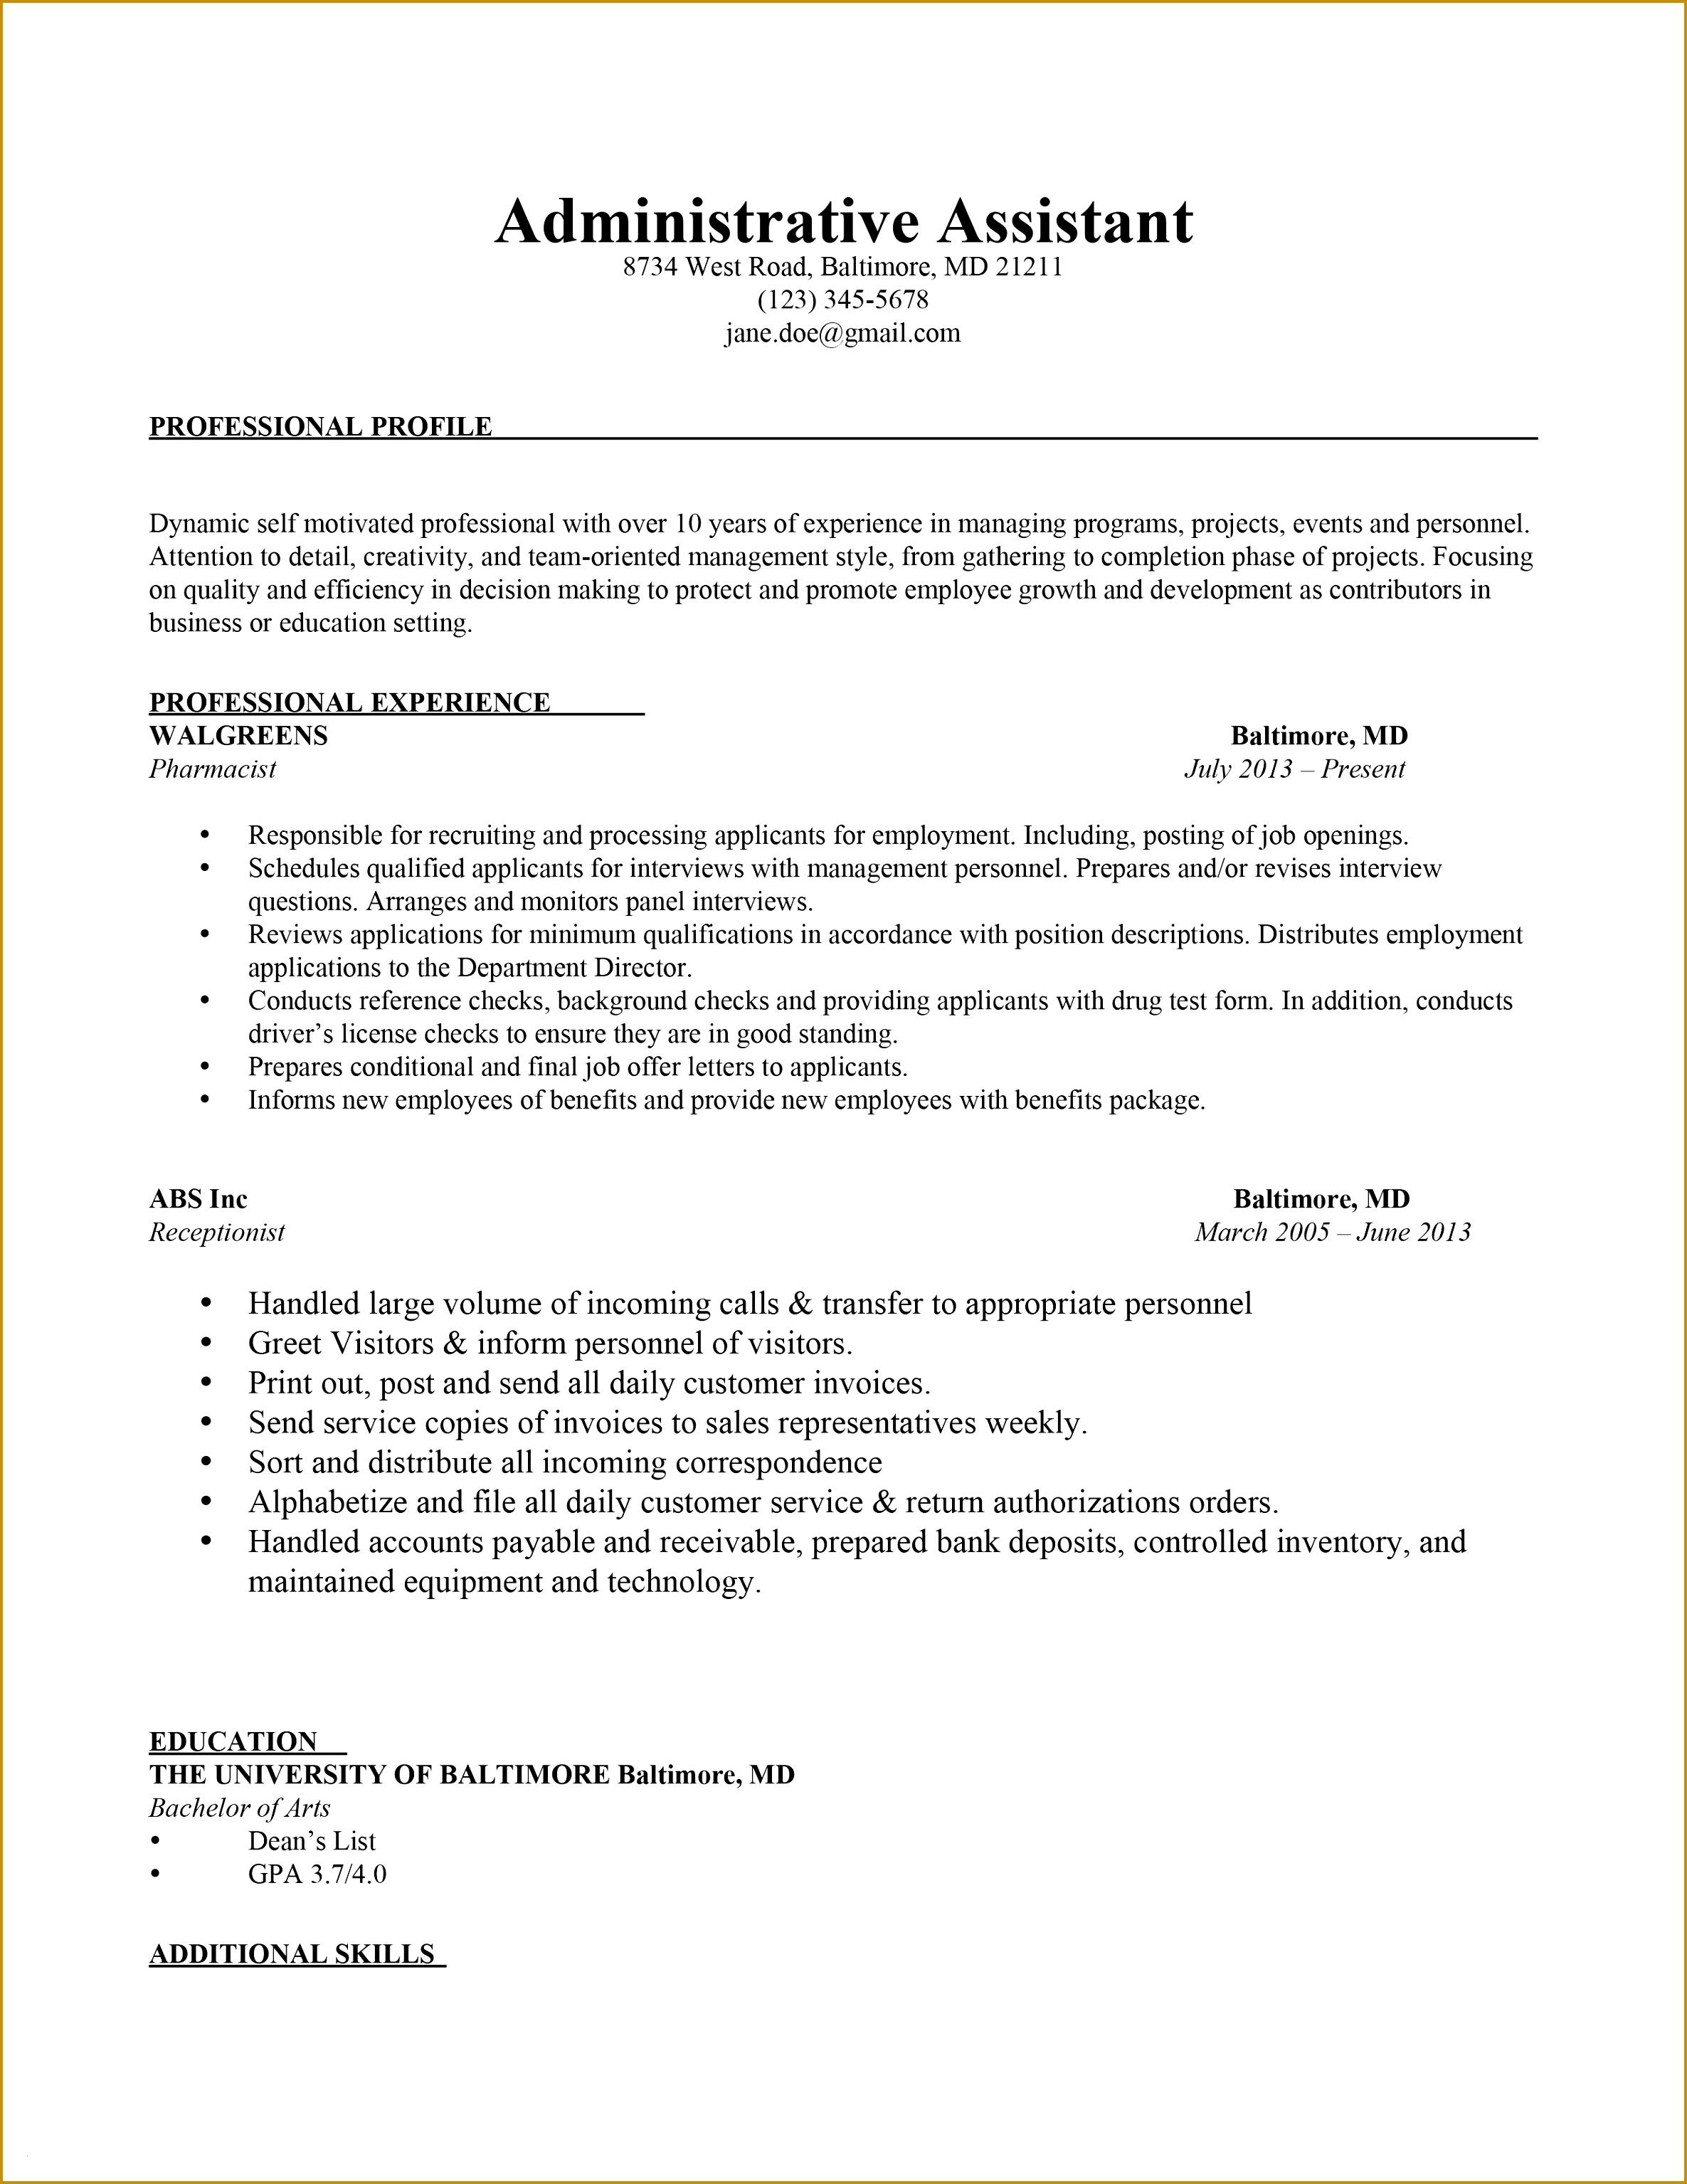 Administrative assistant Job Resume Inspirational Elegant Example Resume Cover Letter Lovely Od Specialist Sample 30692371